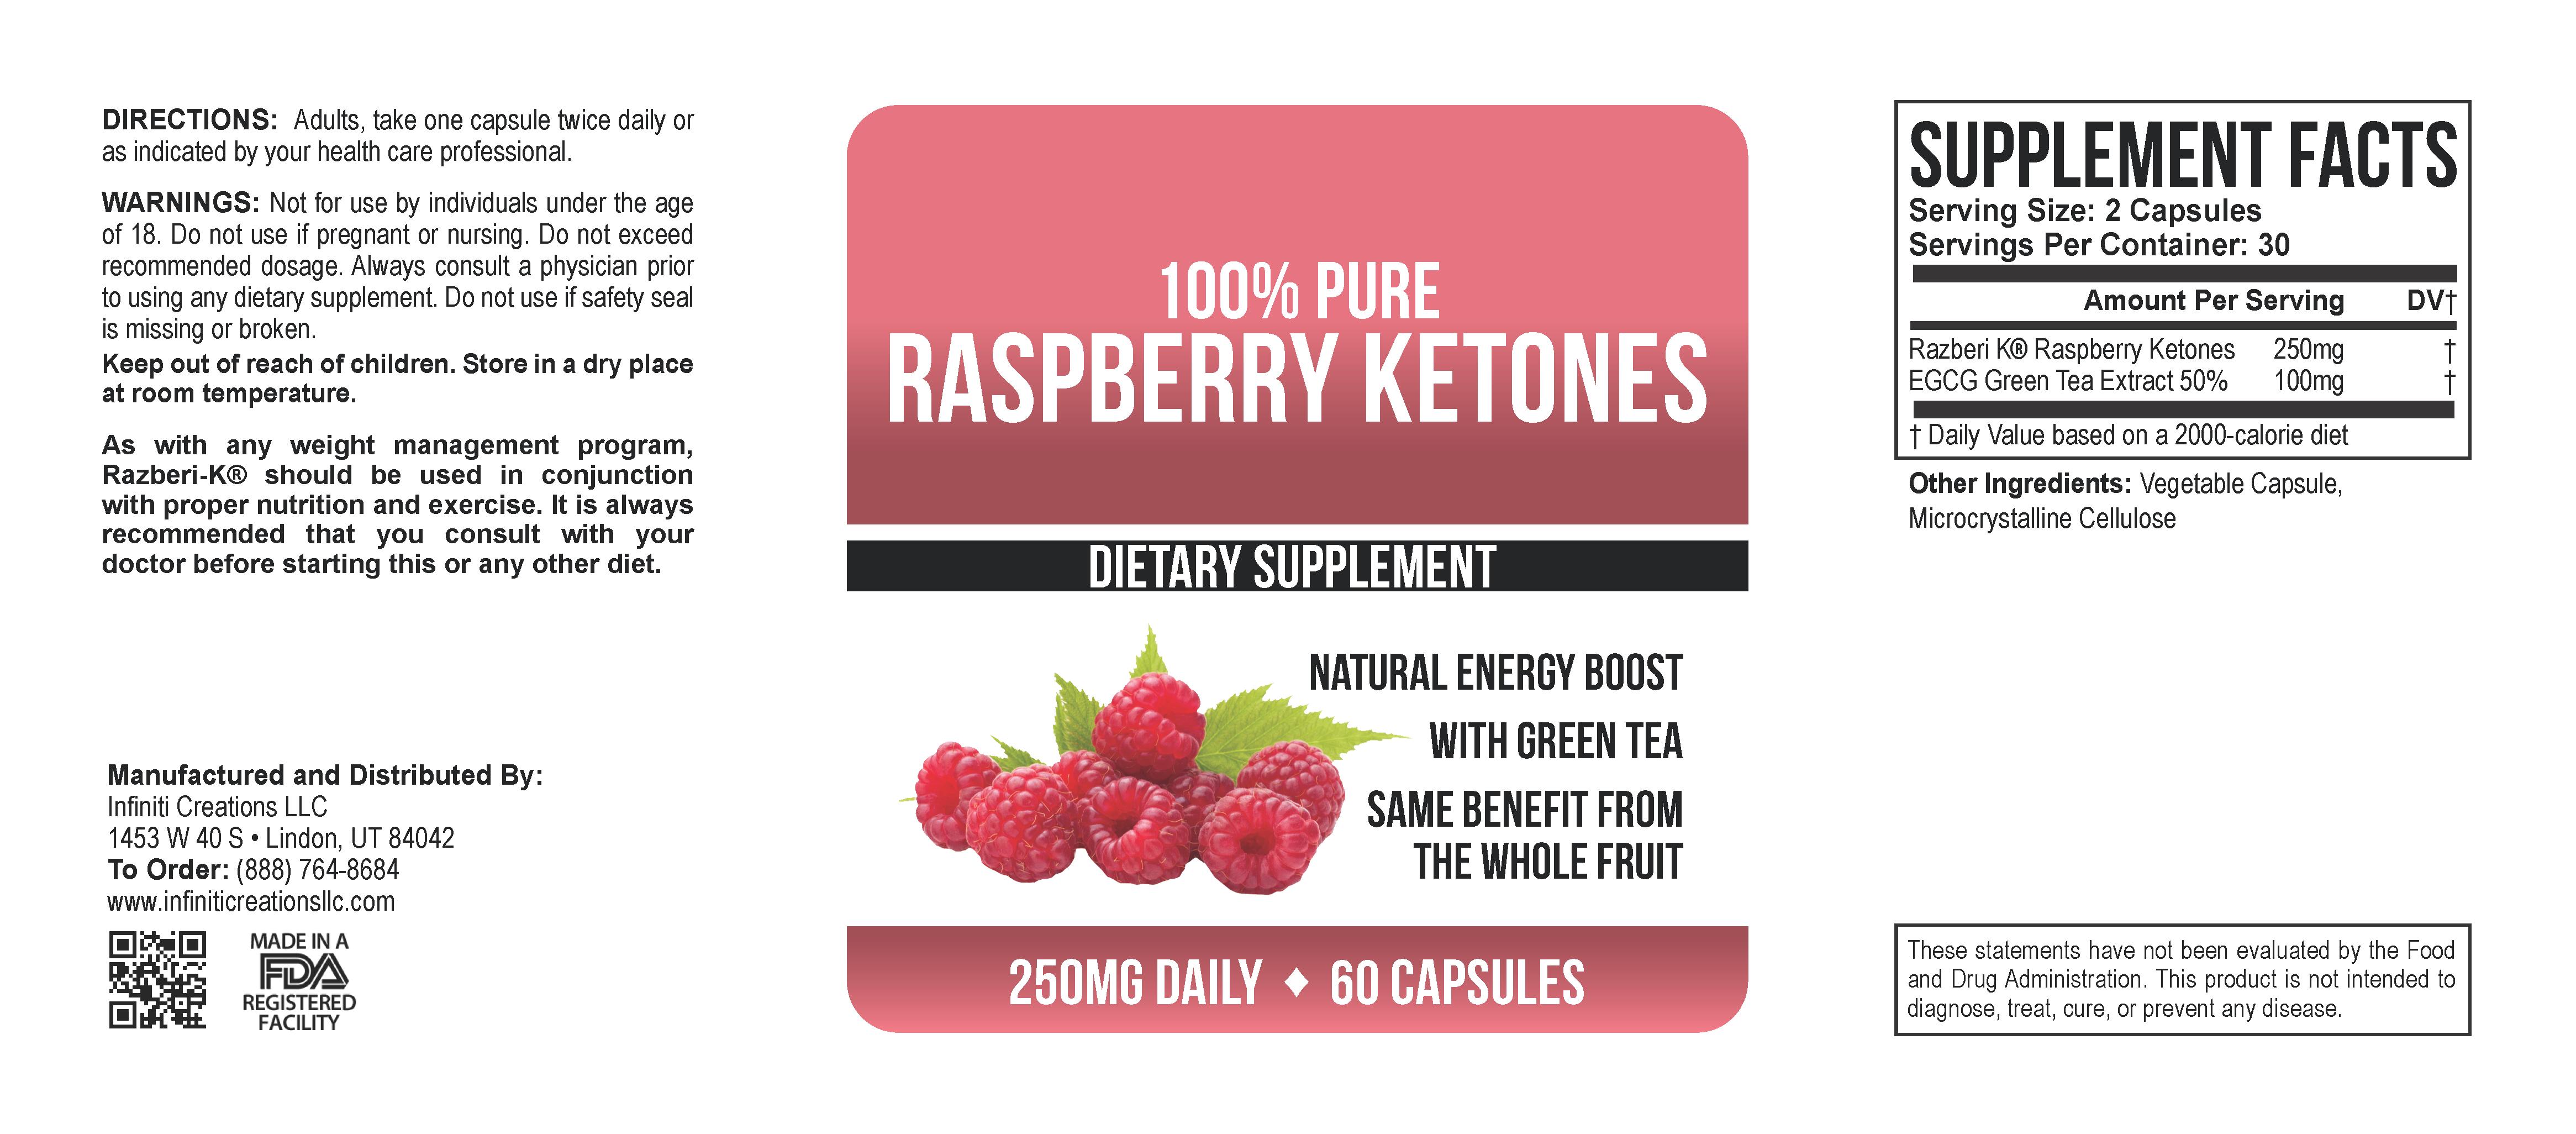 infiniti-creations-raspberry-ketones-250mg-v2.png